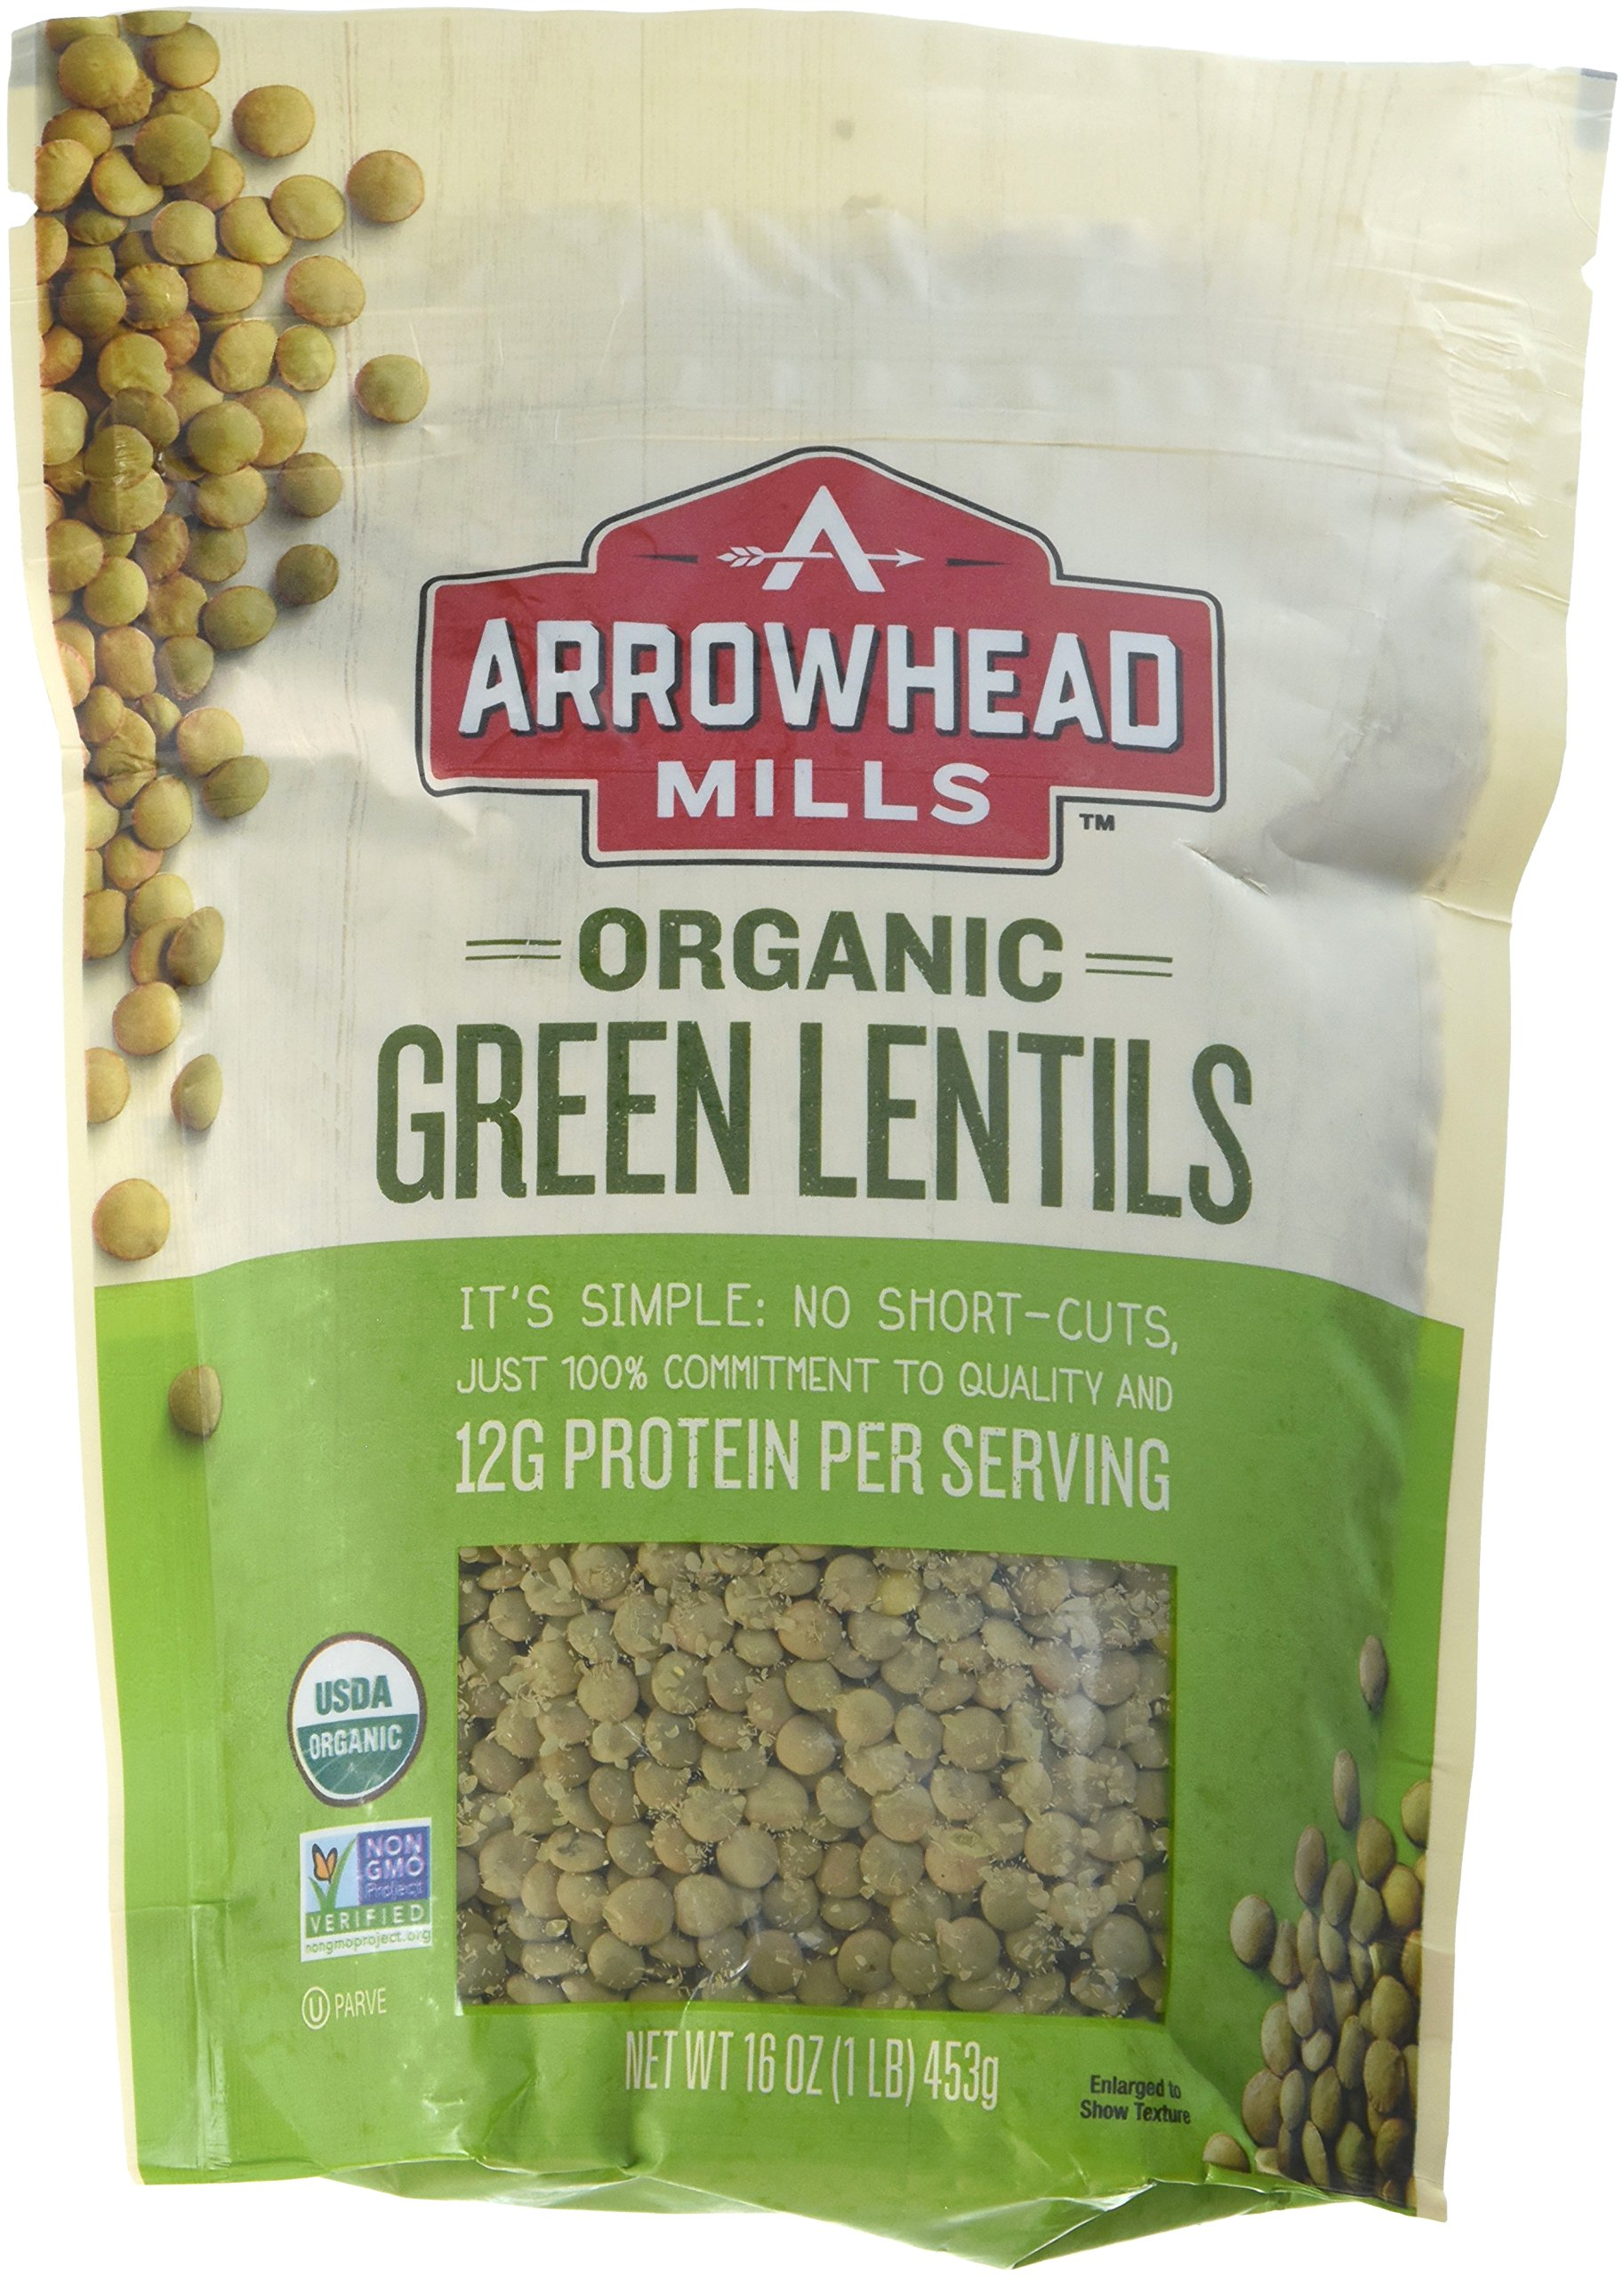 Arrowhead Mills Organic Green Lentils, 16-Ounce Bags (Pack of 6)